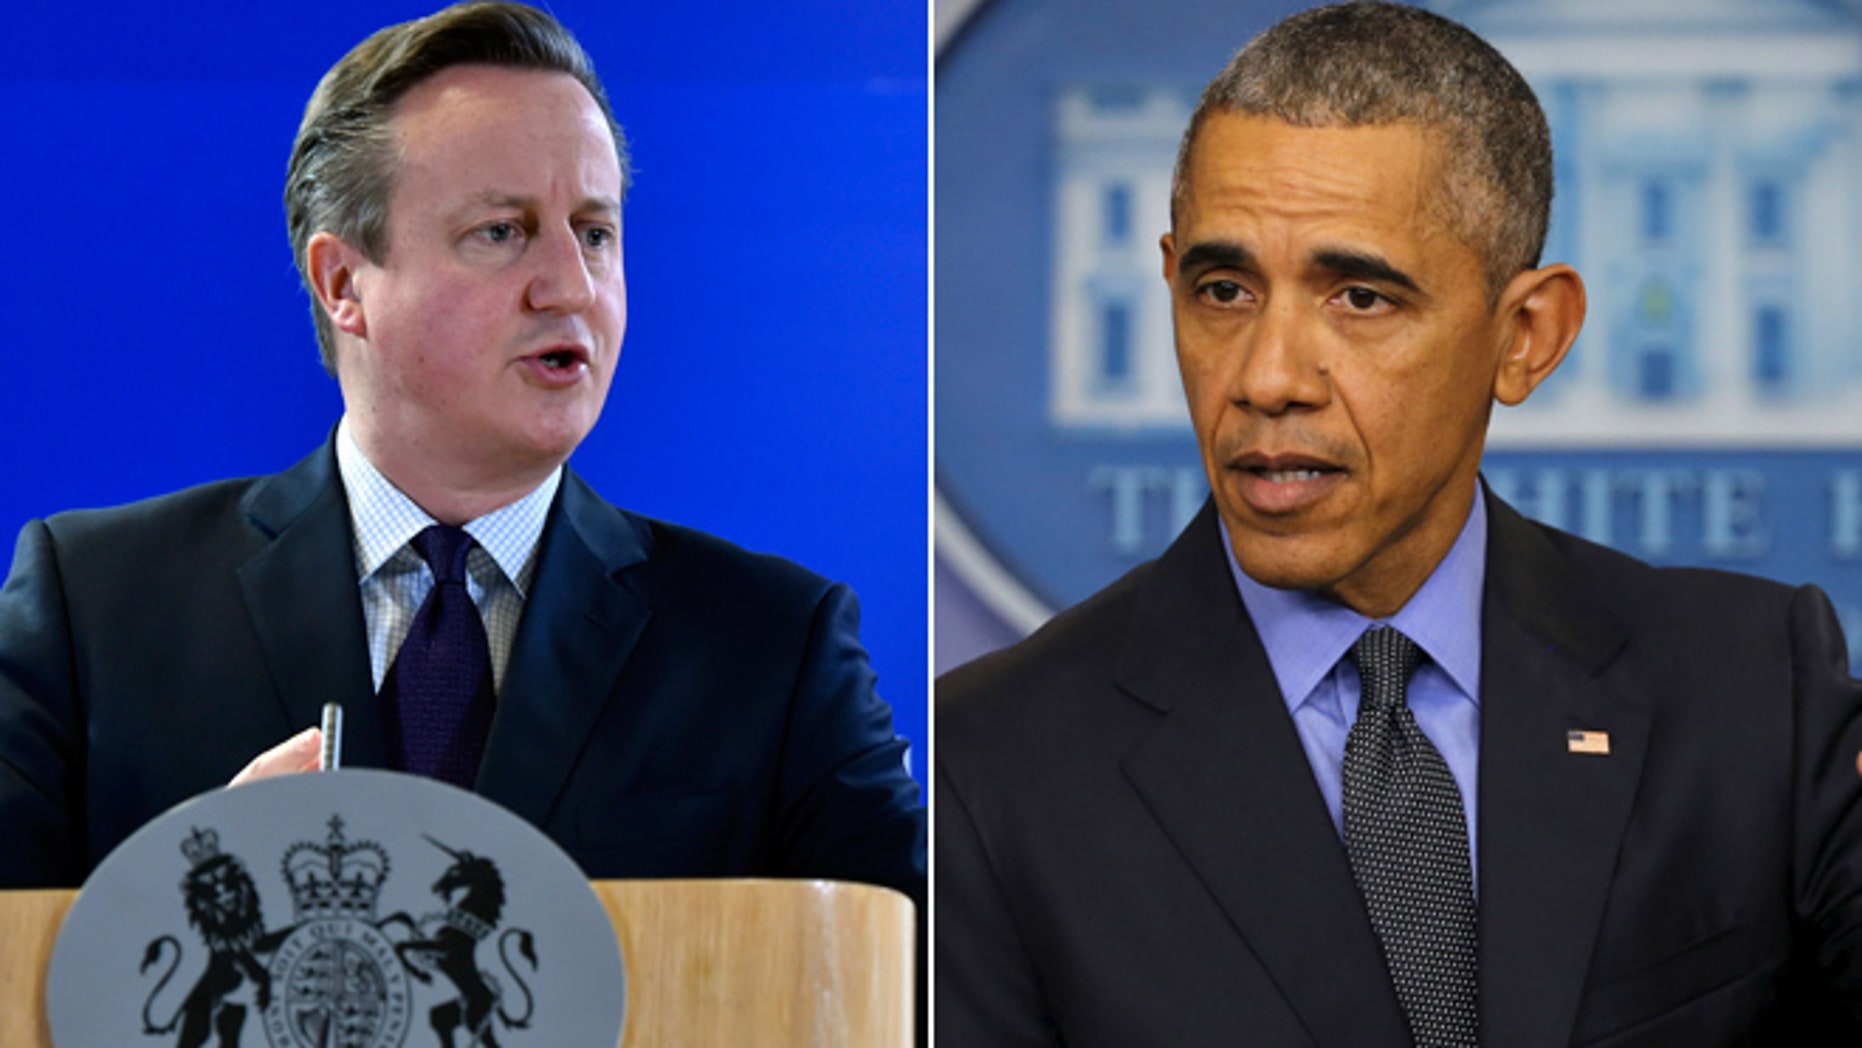 On left, UK Prime Minister David Cameron; on right, President Obama